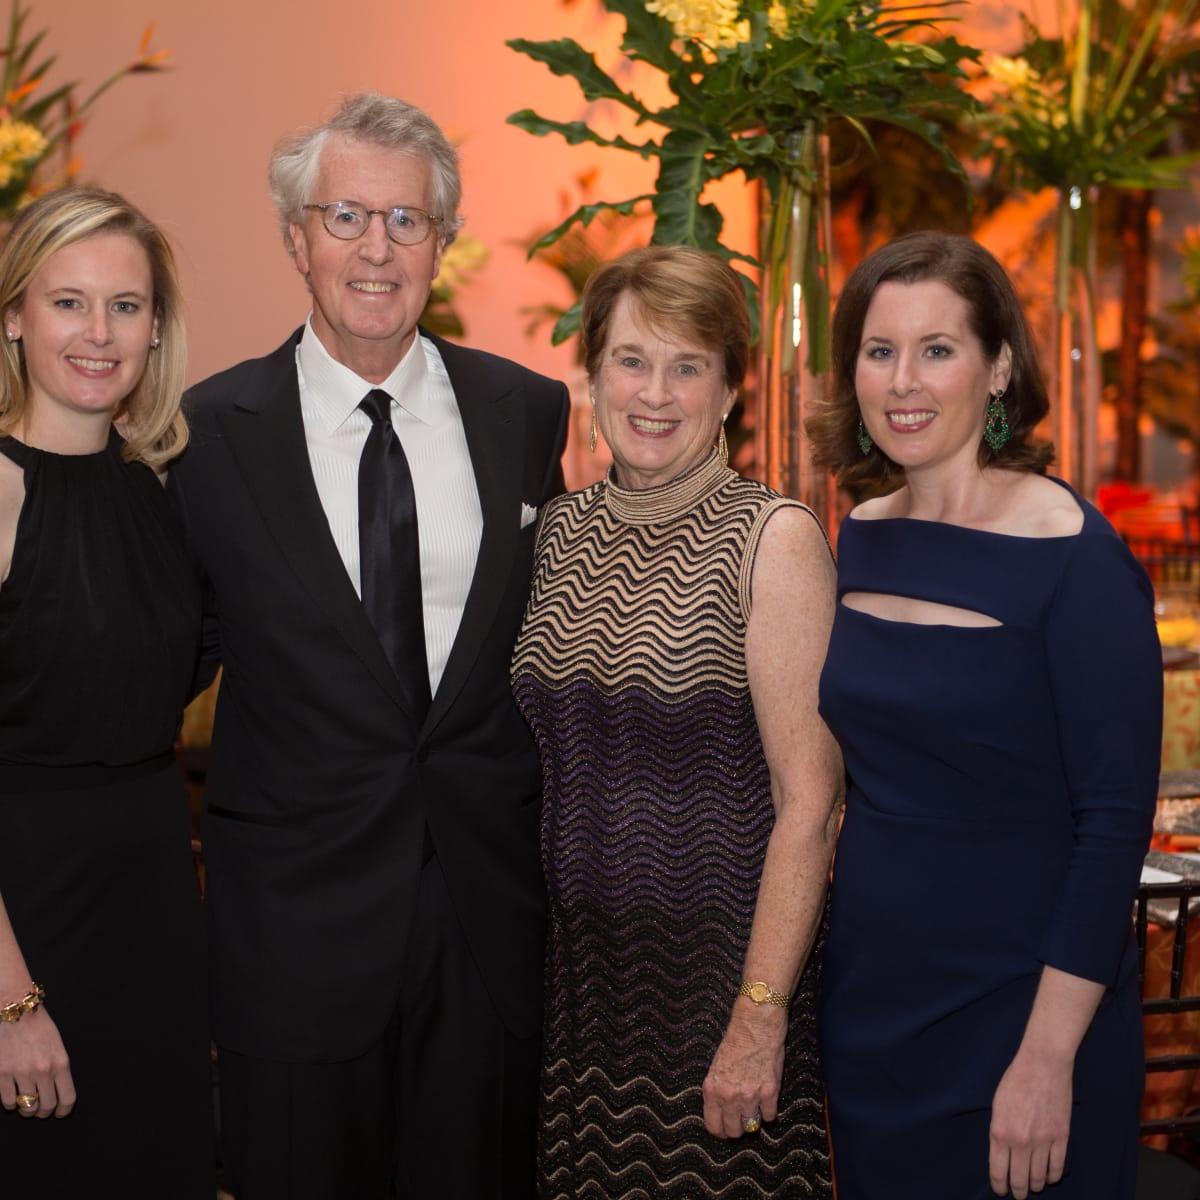 News, MFAH Latin Experience, Nov. 2015 Madeline Kelly; George and Linda Kelly; Sara Kelly